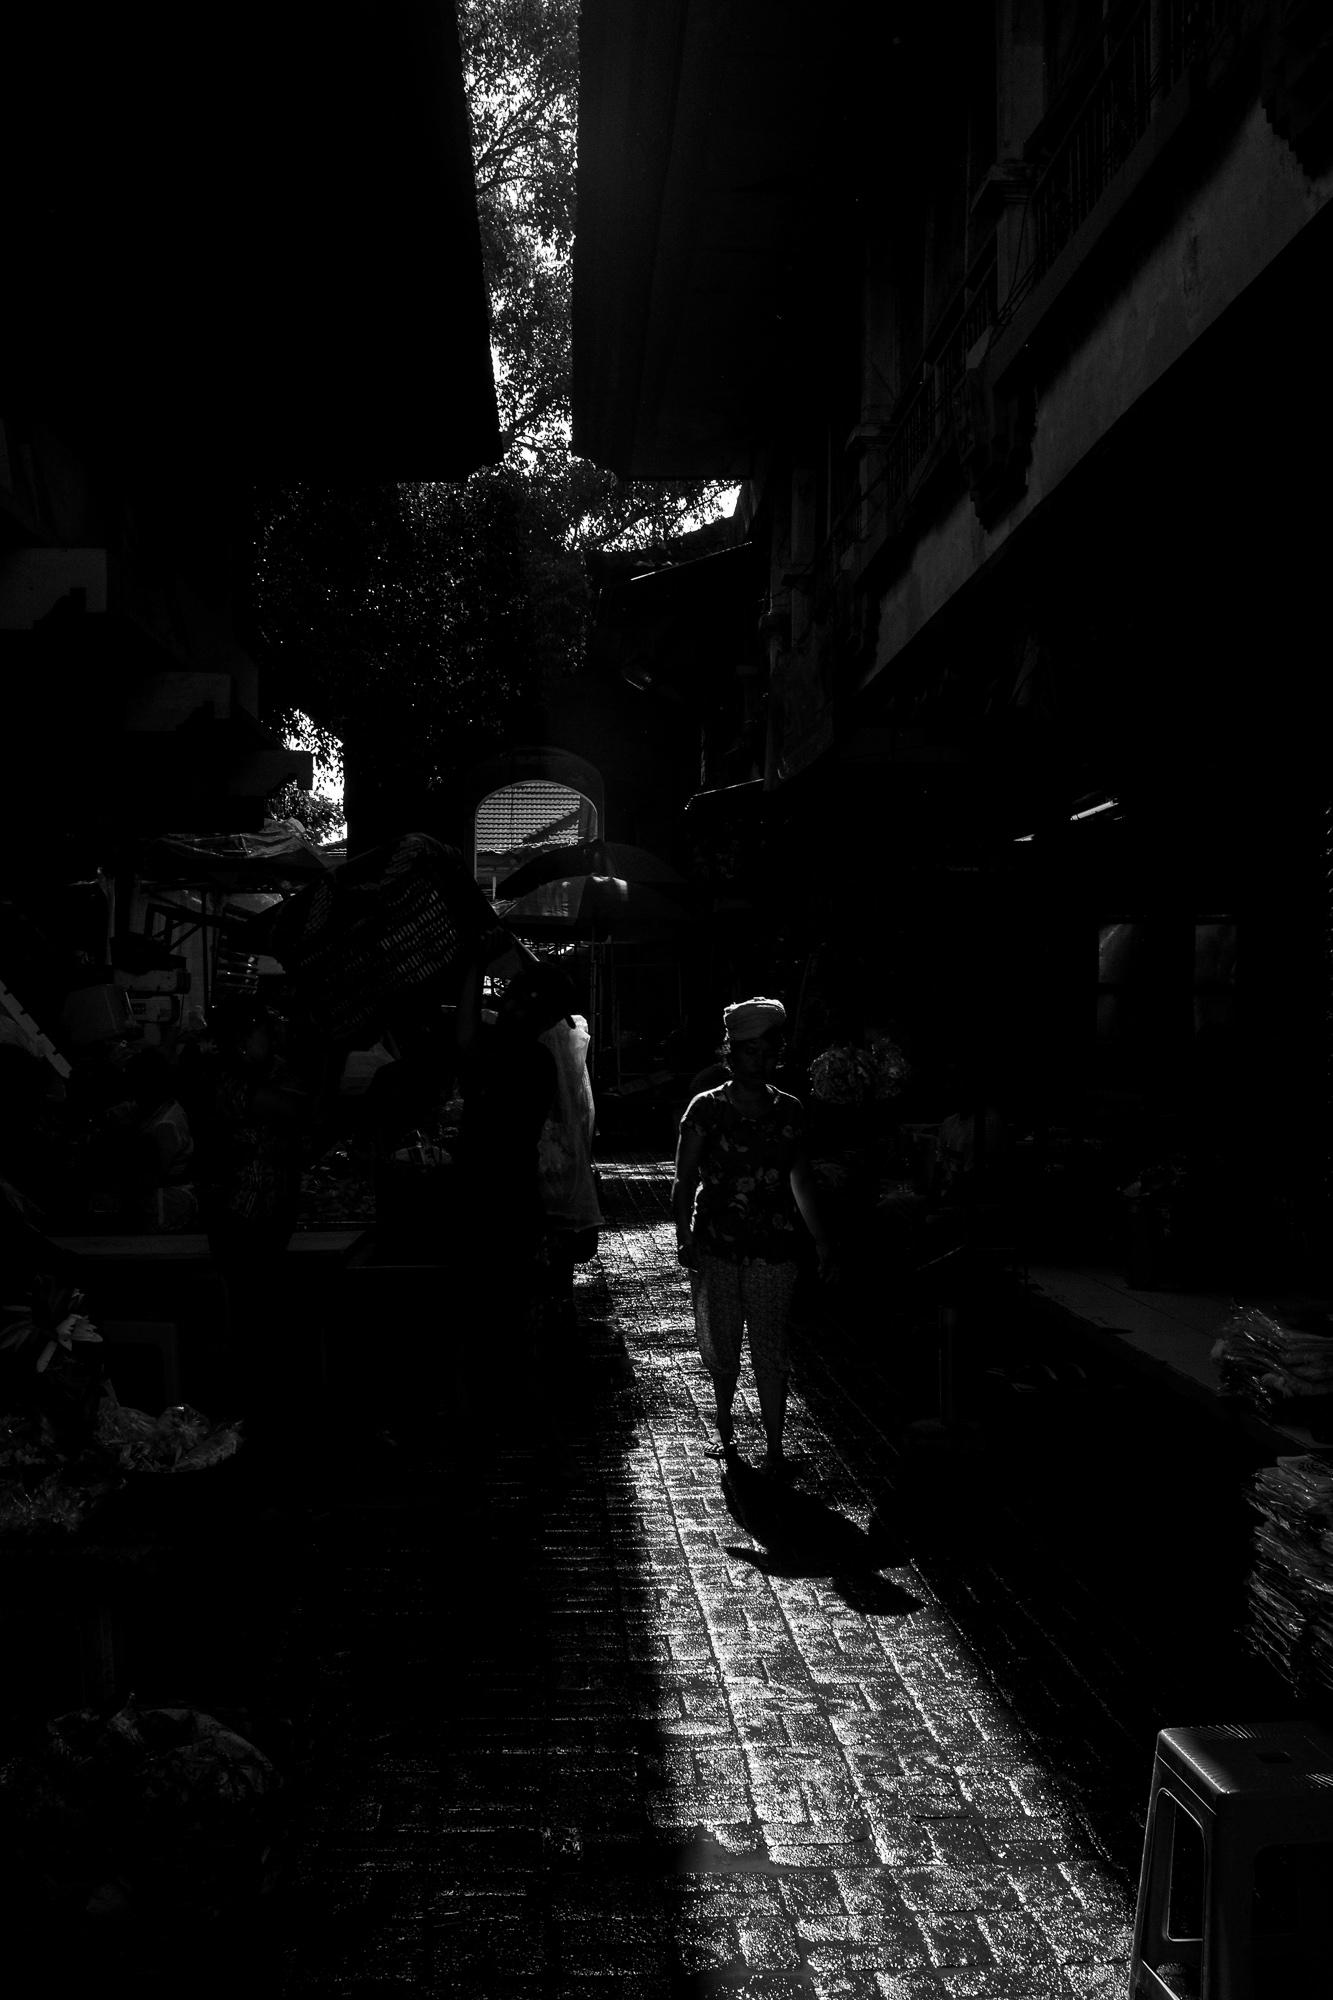 Moody Silhouette at Pasar Ubud - Bali Street Photographer